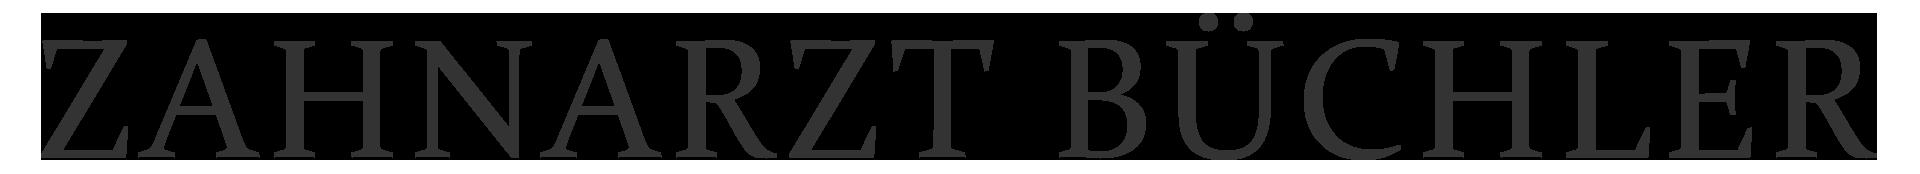 Zahnarzt Büchler Logo